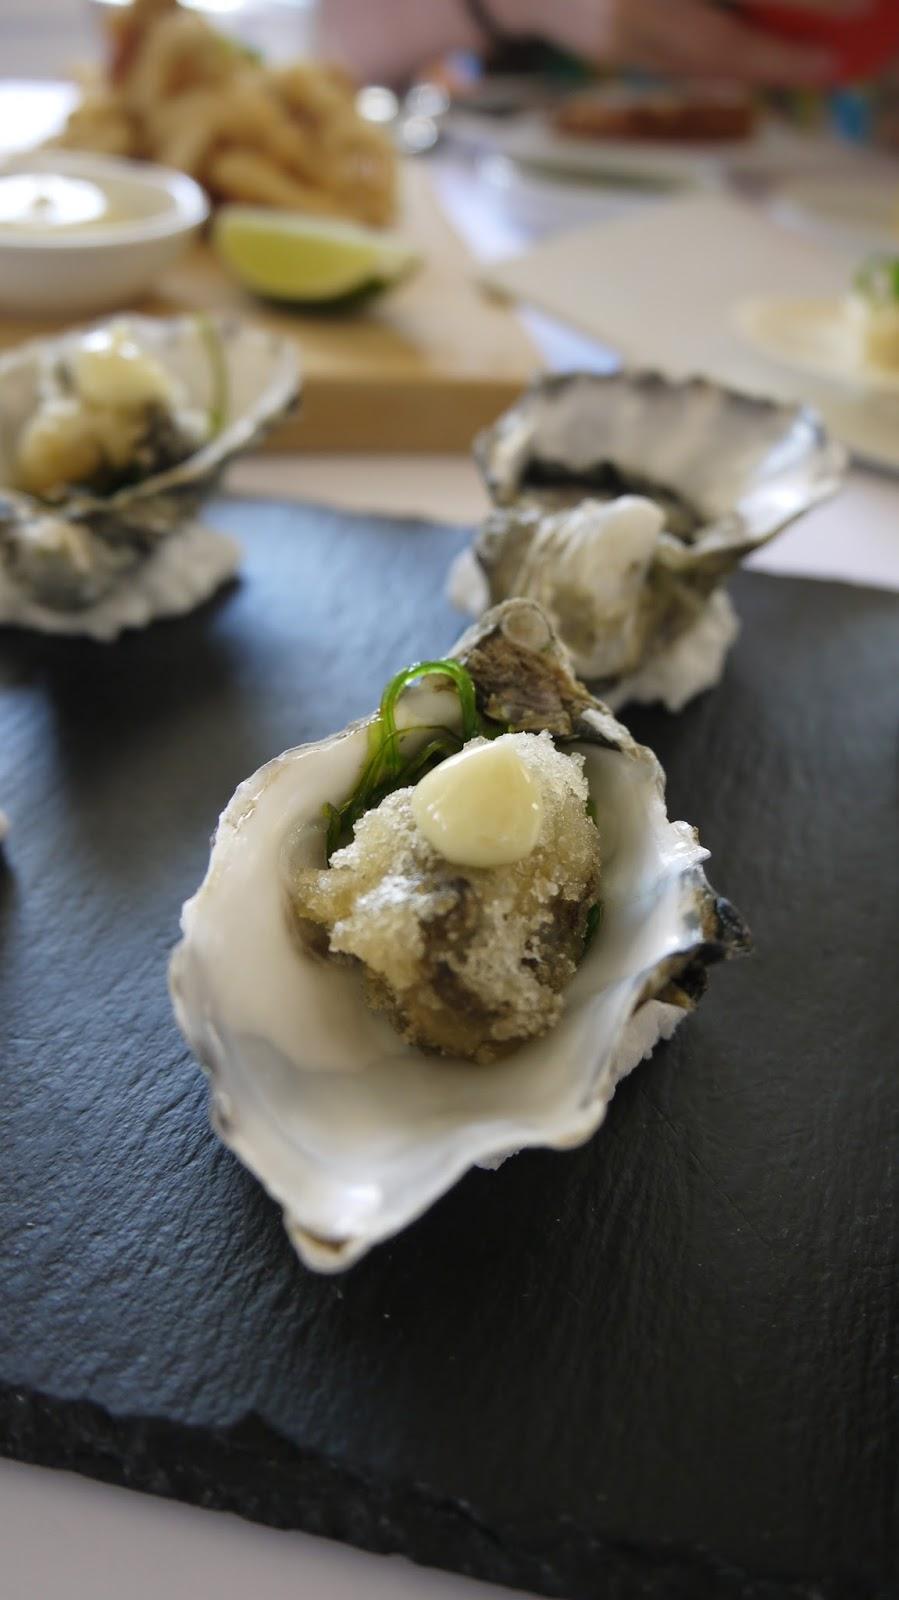 Star of Greece, Pt Willunga, Fleurieu Peninsula, Beach, SA, Adelaide, Modern Australian, Steak, Seafood, Fish, Oysters